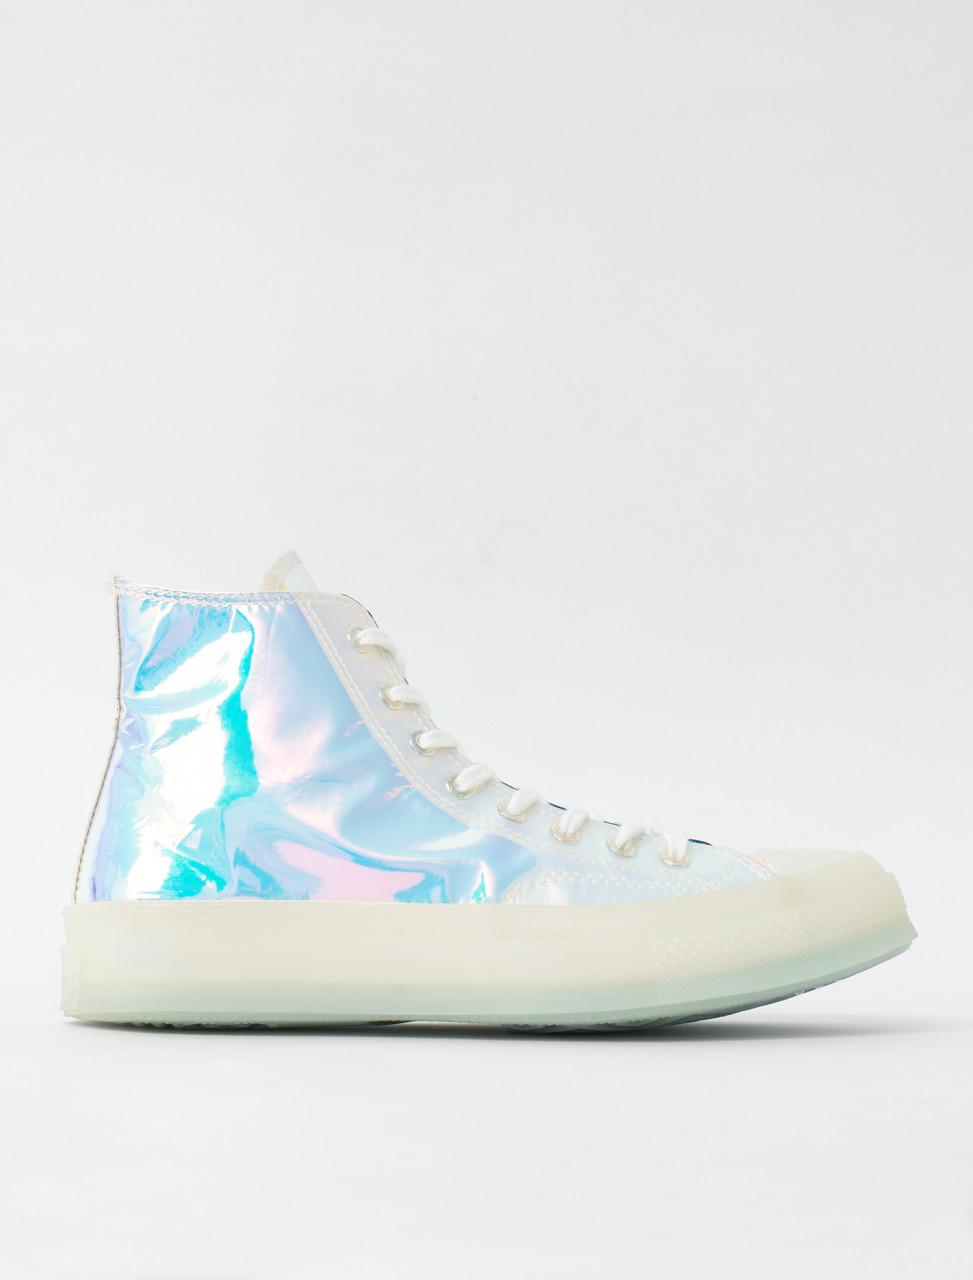 Chuck 70 HI Iridescent Sneaker